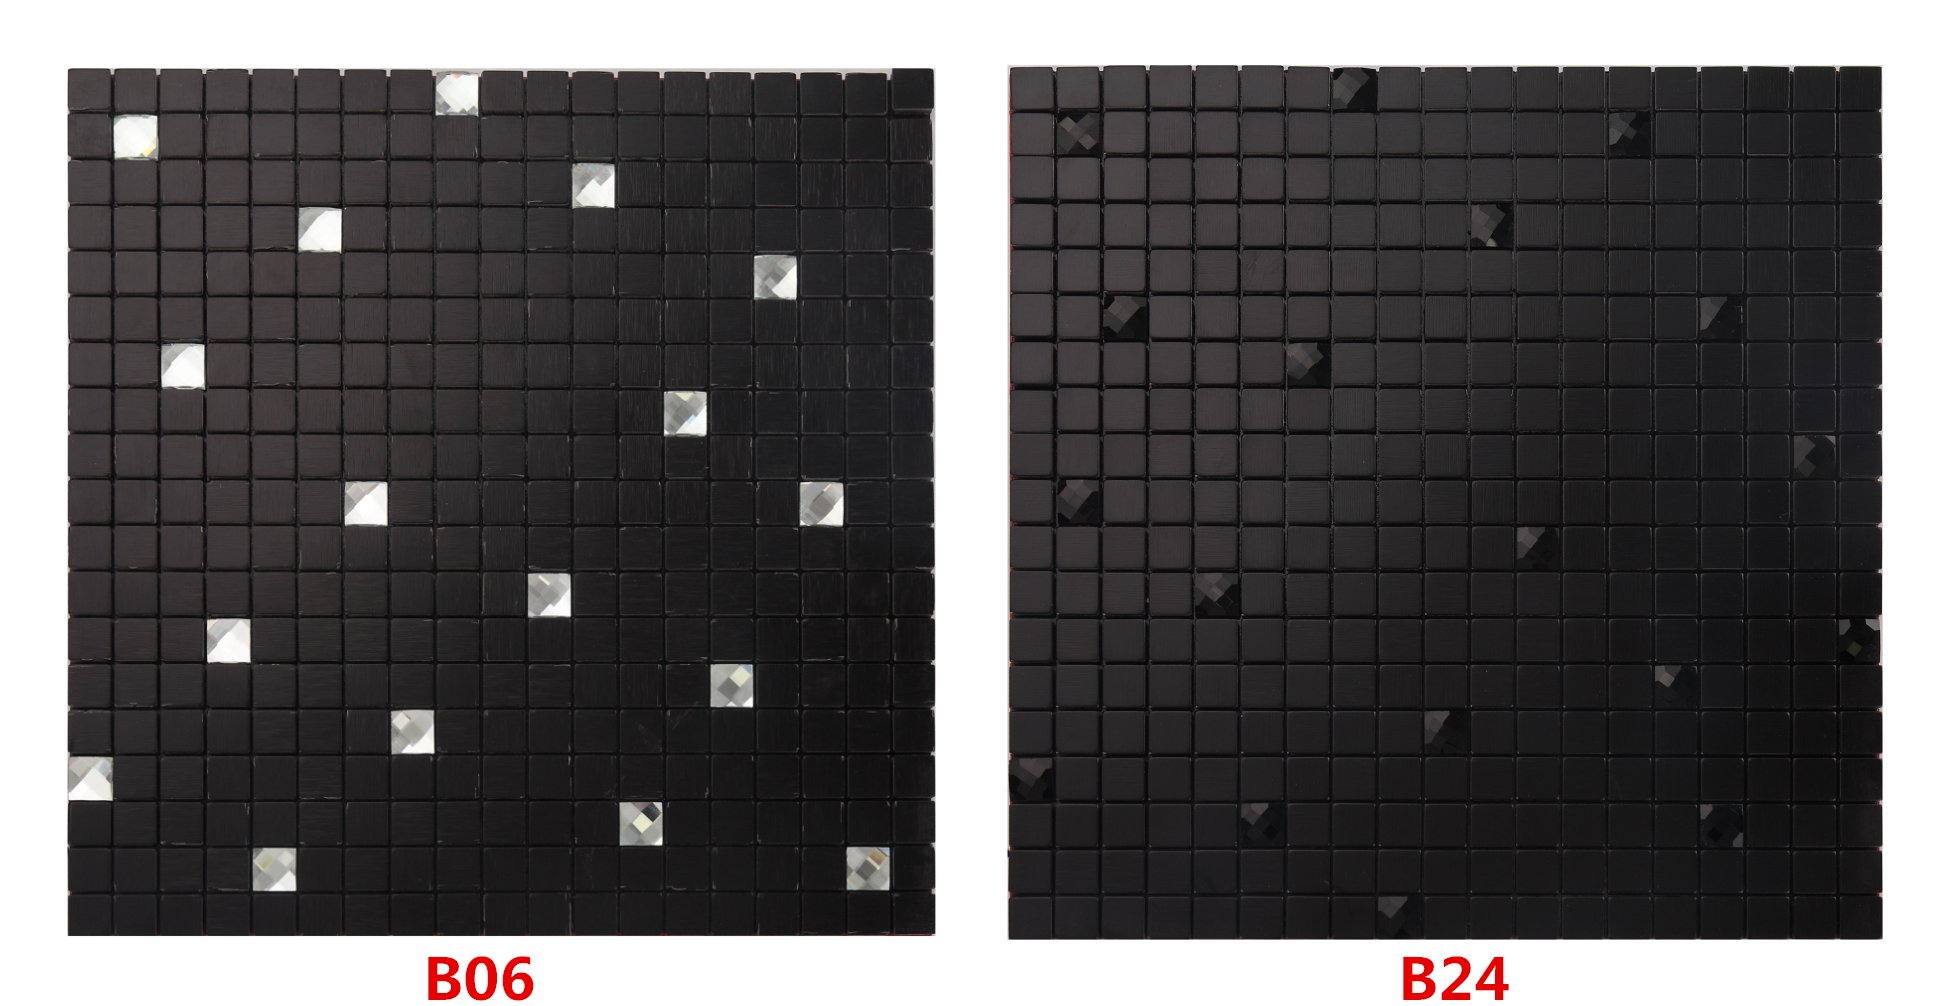 12''x12'' Peel and Stick Backsplah Tile Self Adhesive Mosaic Backsplash for Kitchen- B06 (5PCS 5.38Sq.ft)